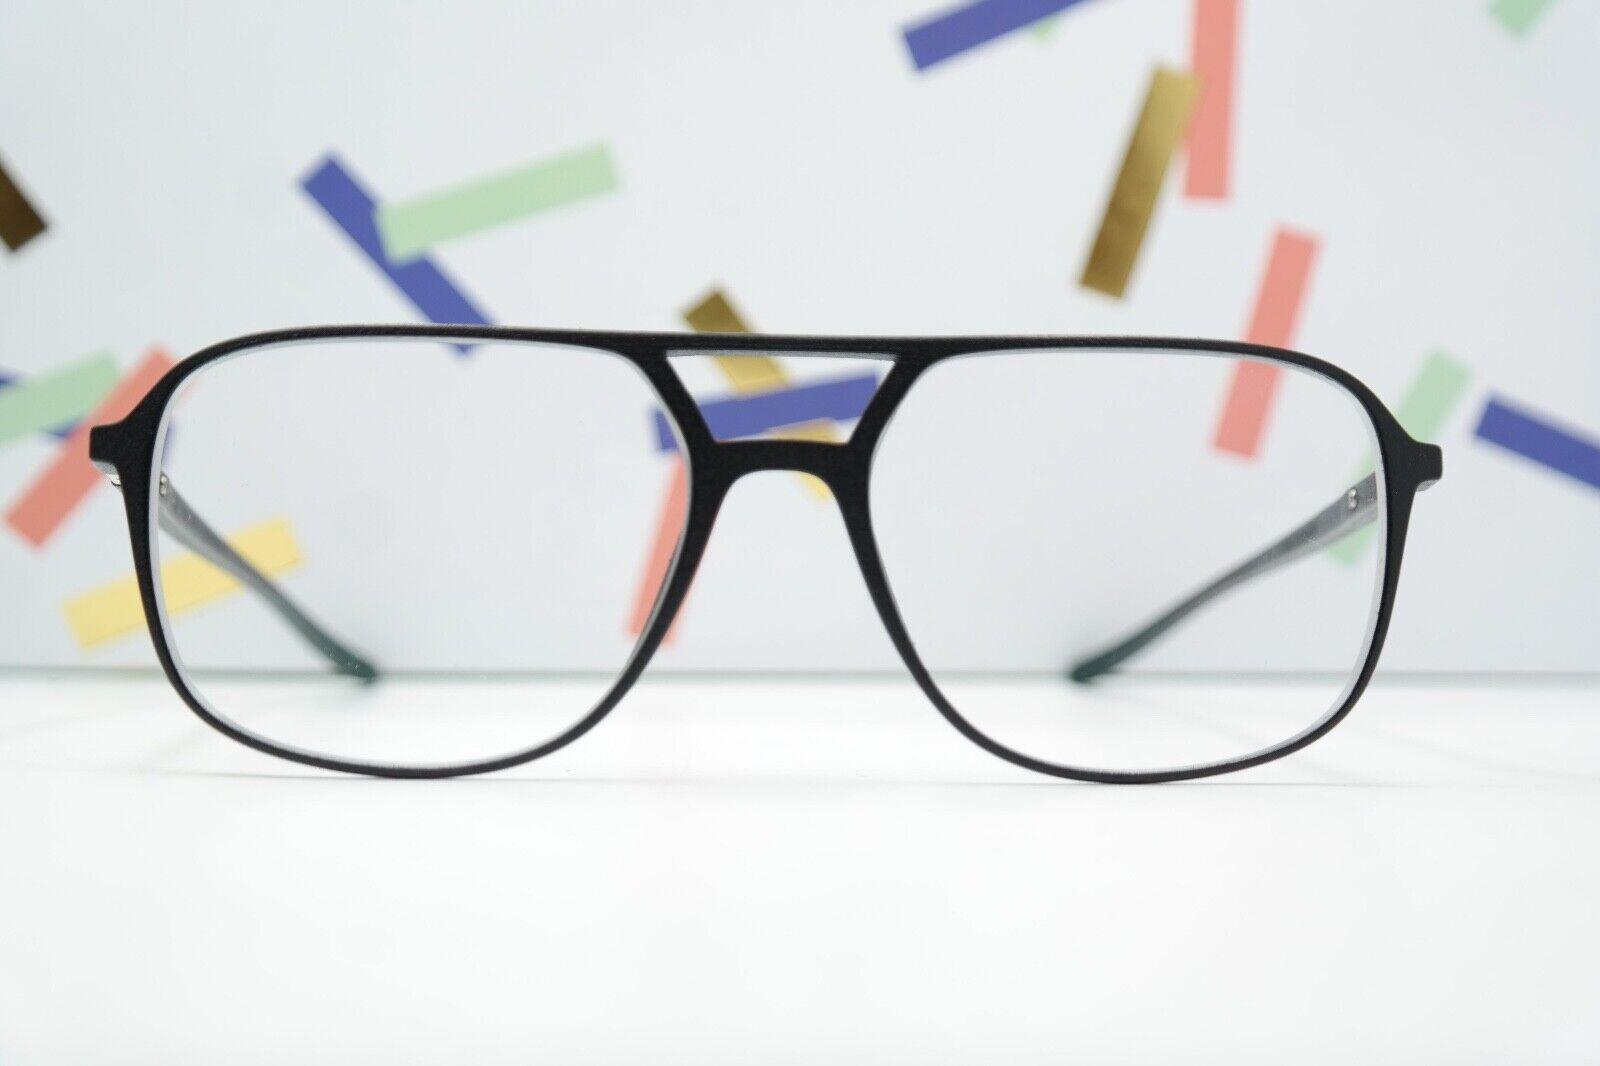 Brille Brillengestell YOU MAWO MOD. Ketil Col.A01 schwarz 3D print 55/18 135 NEU